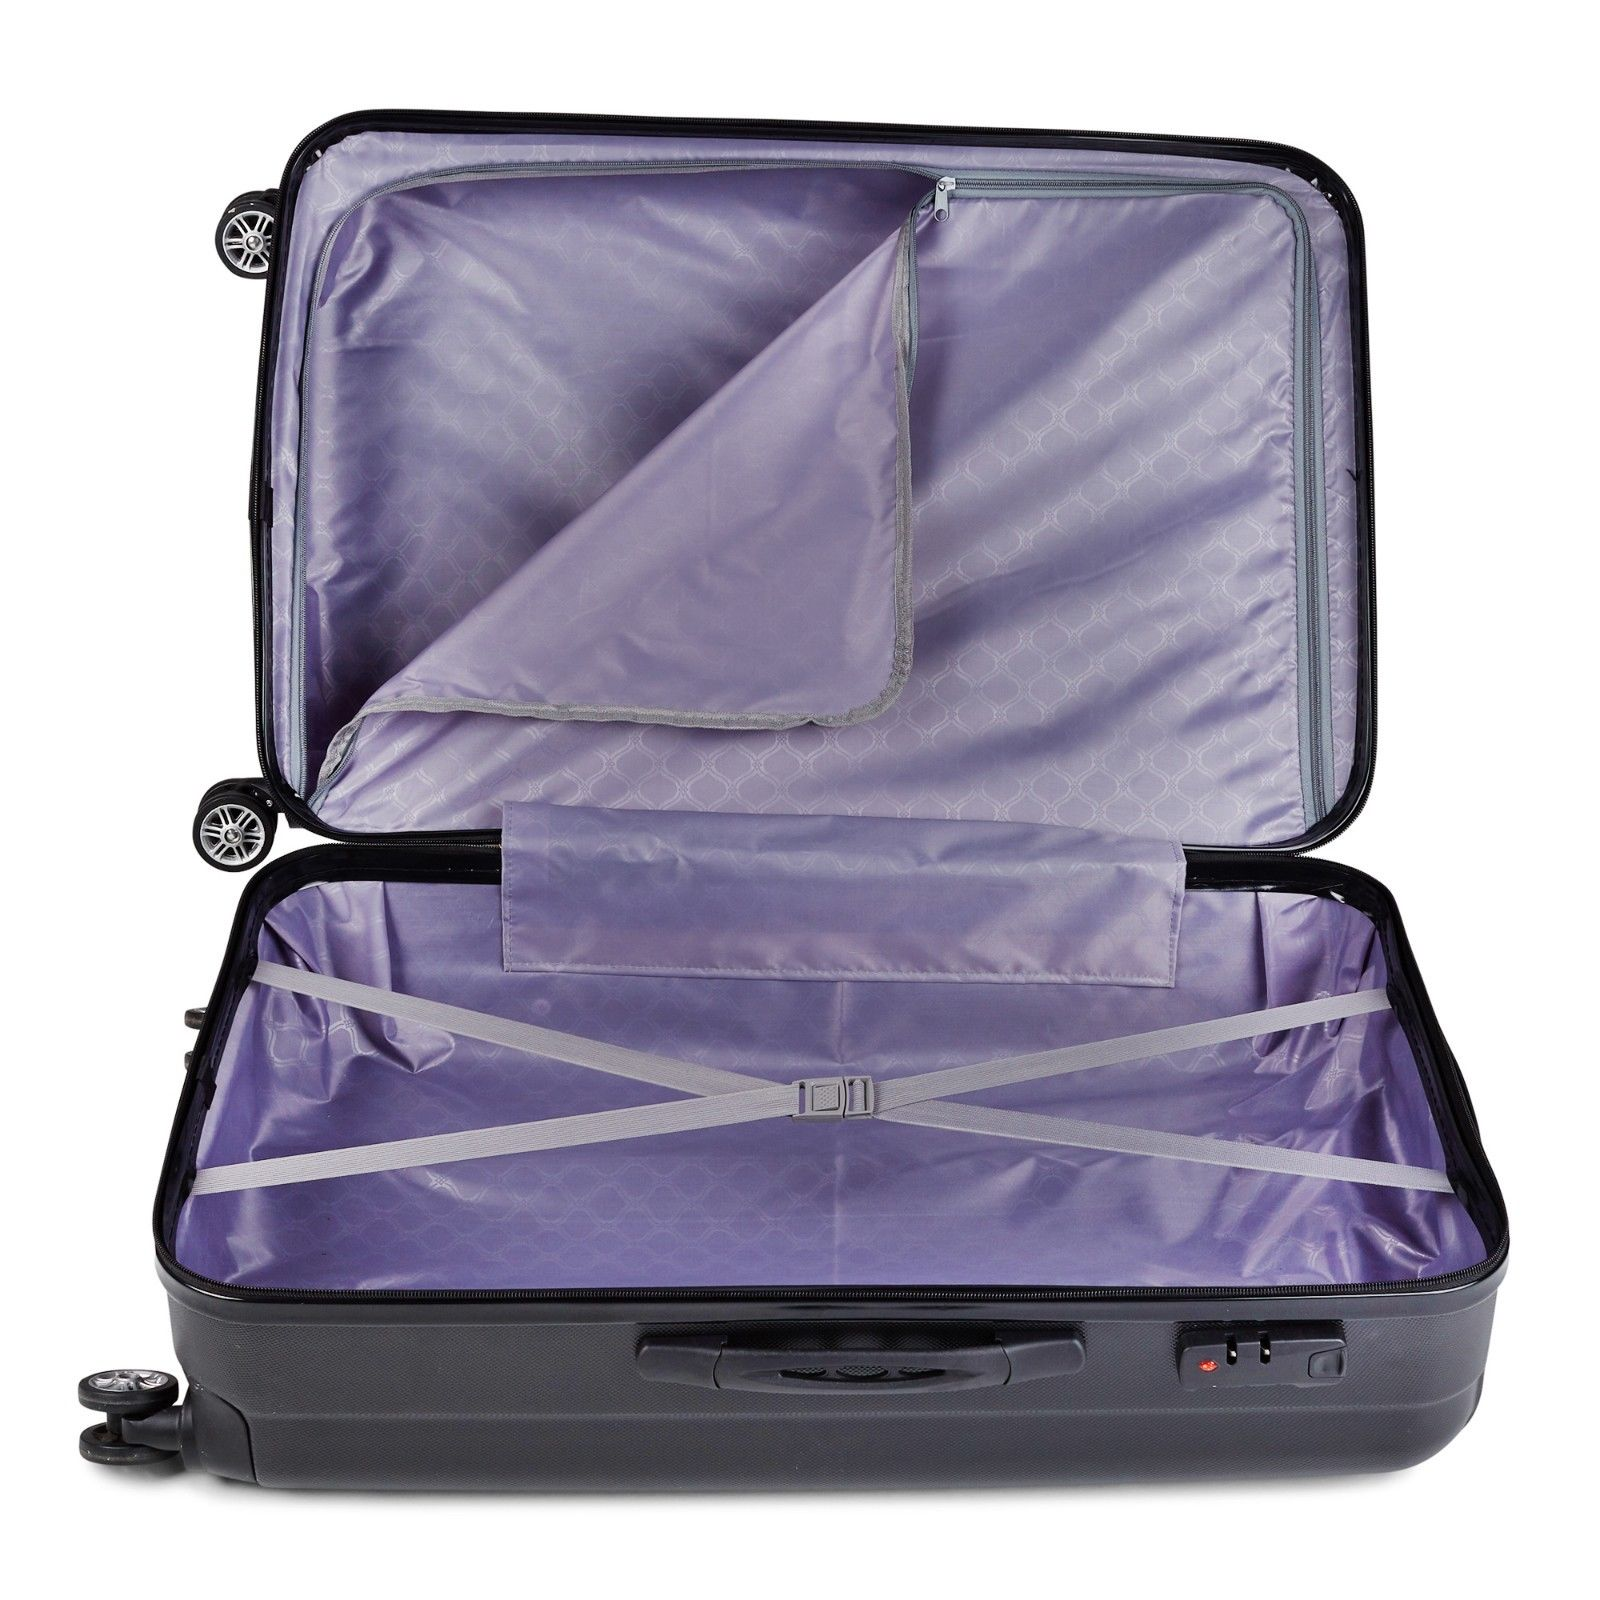 Milano-Premium-3pc-ABS-Luggage-Suitcase-Luxury-Hard-Case-Shockproof-Travel-Set thumbnail 12